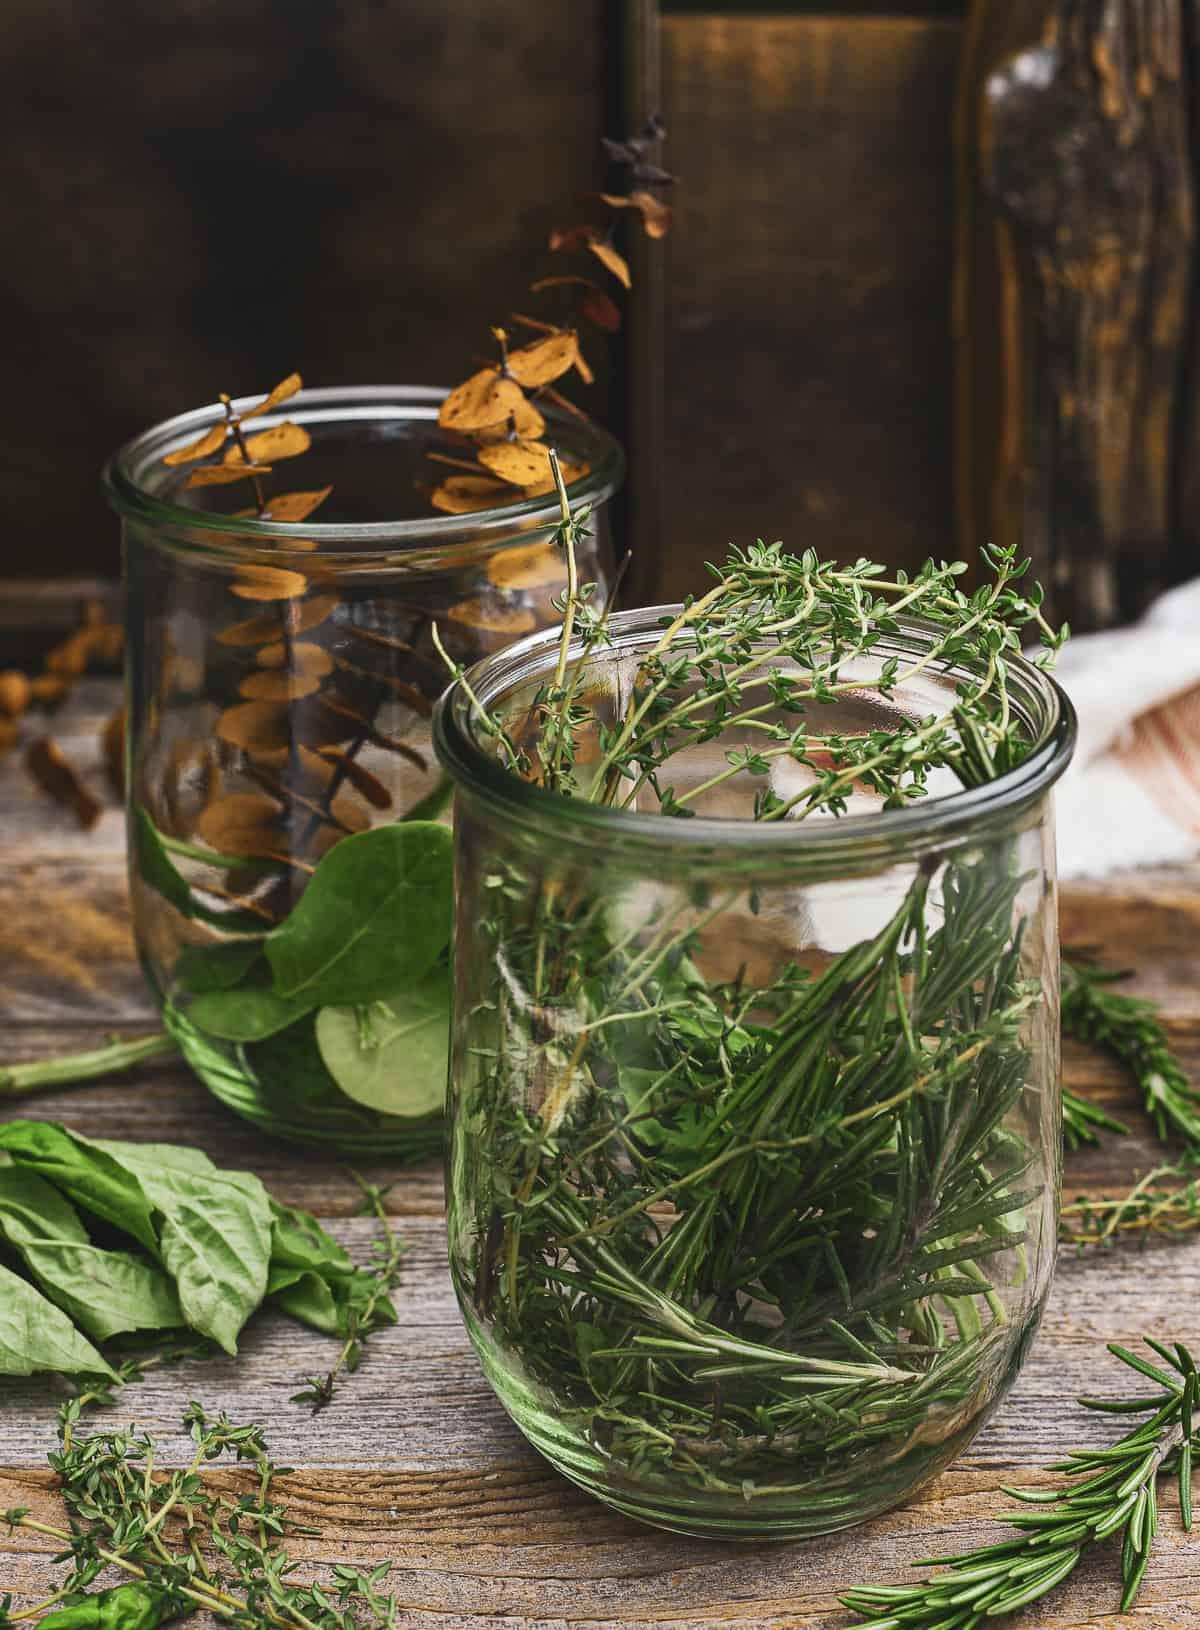 Herbs in glass jars.